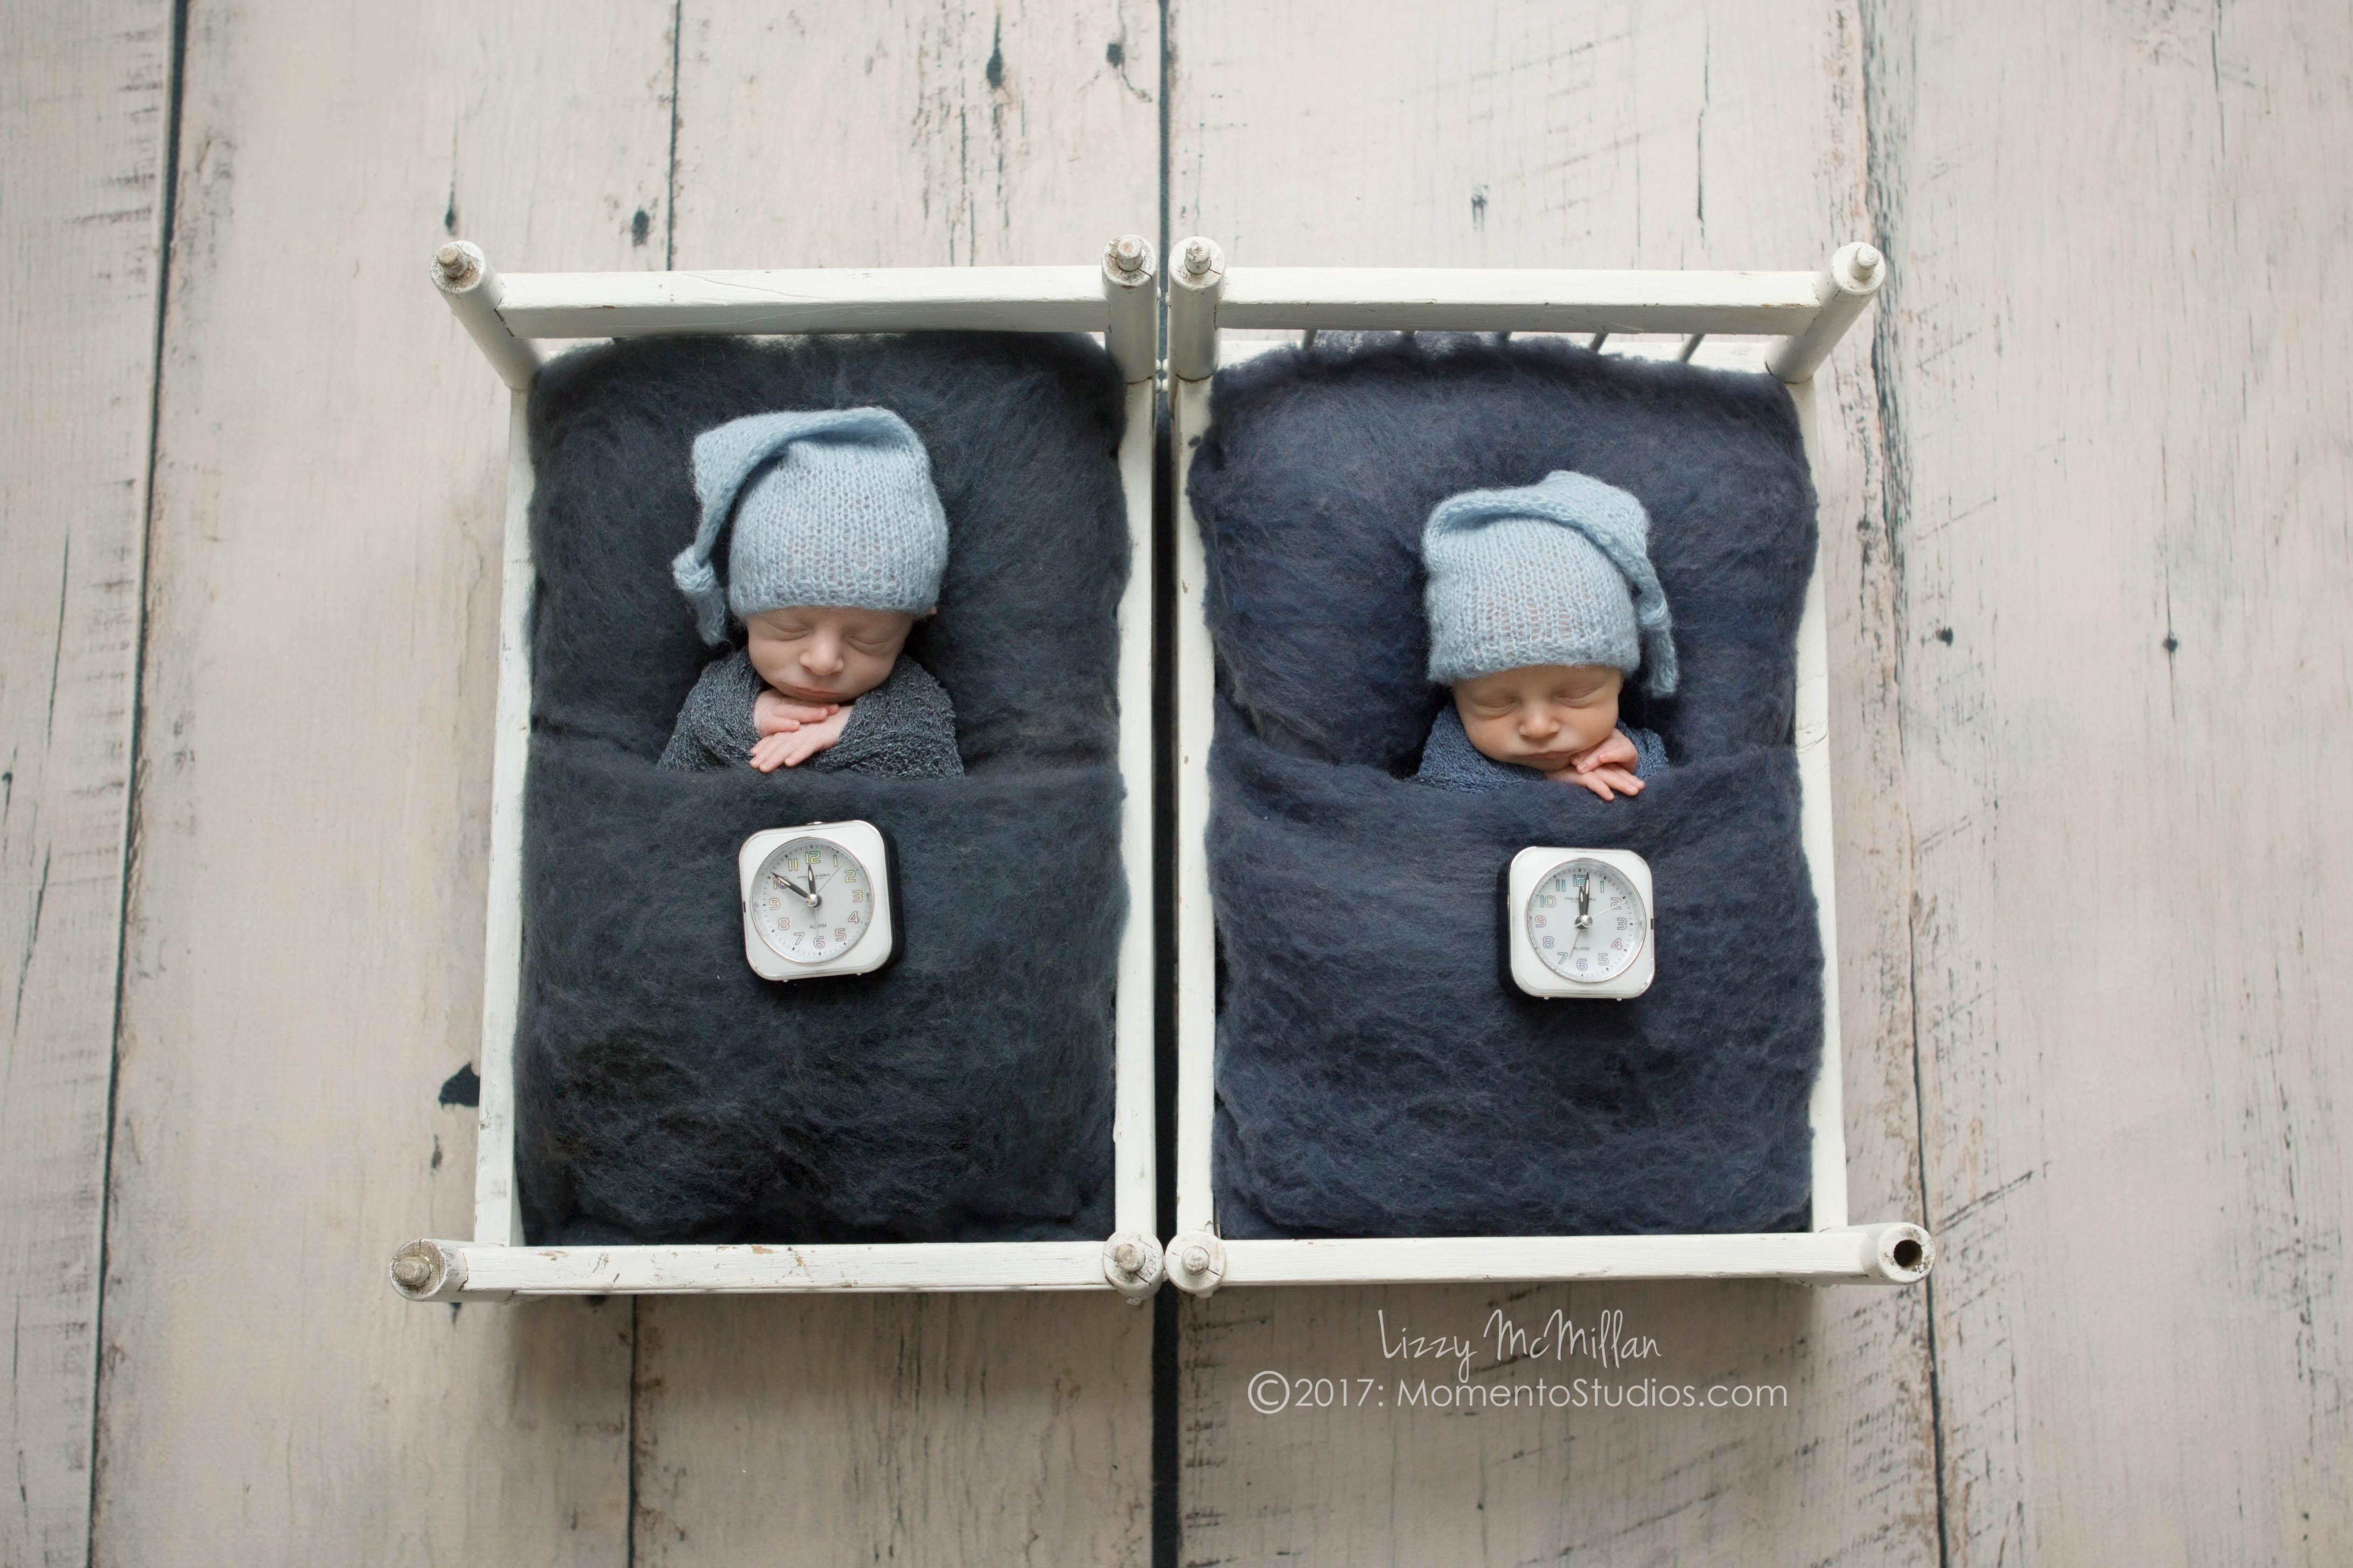 new years eve twins different birthdays doll beds sleep hats wool fluff tiny clocks